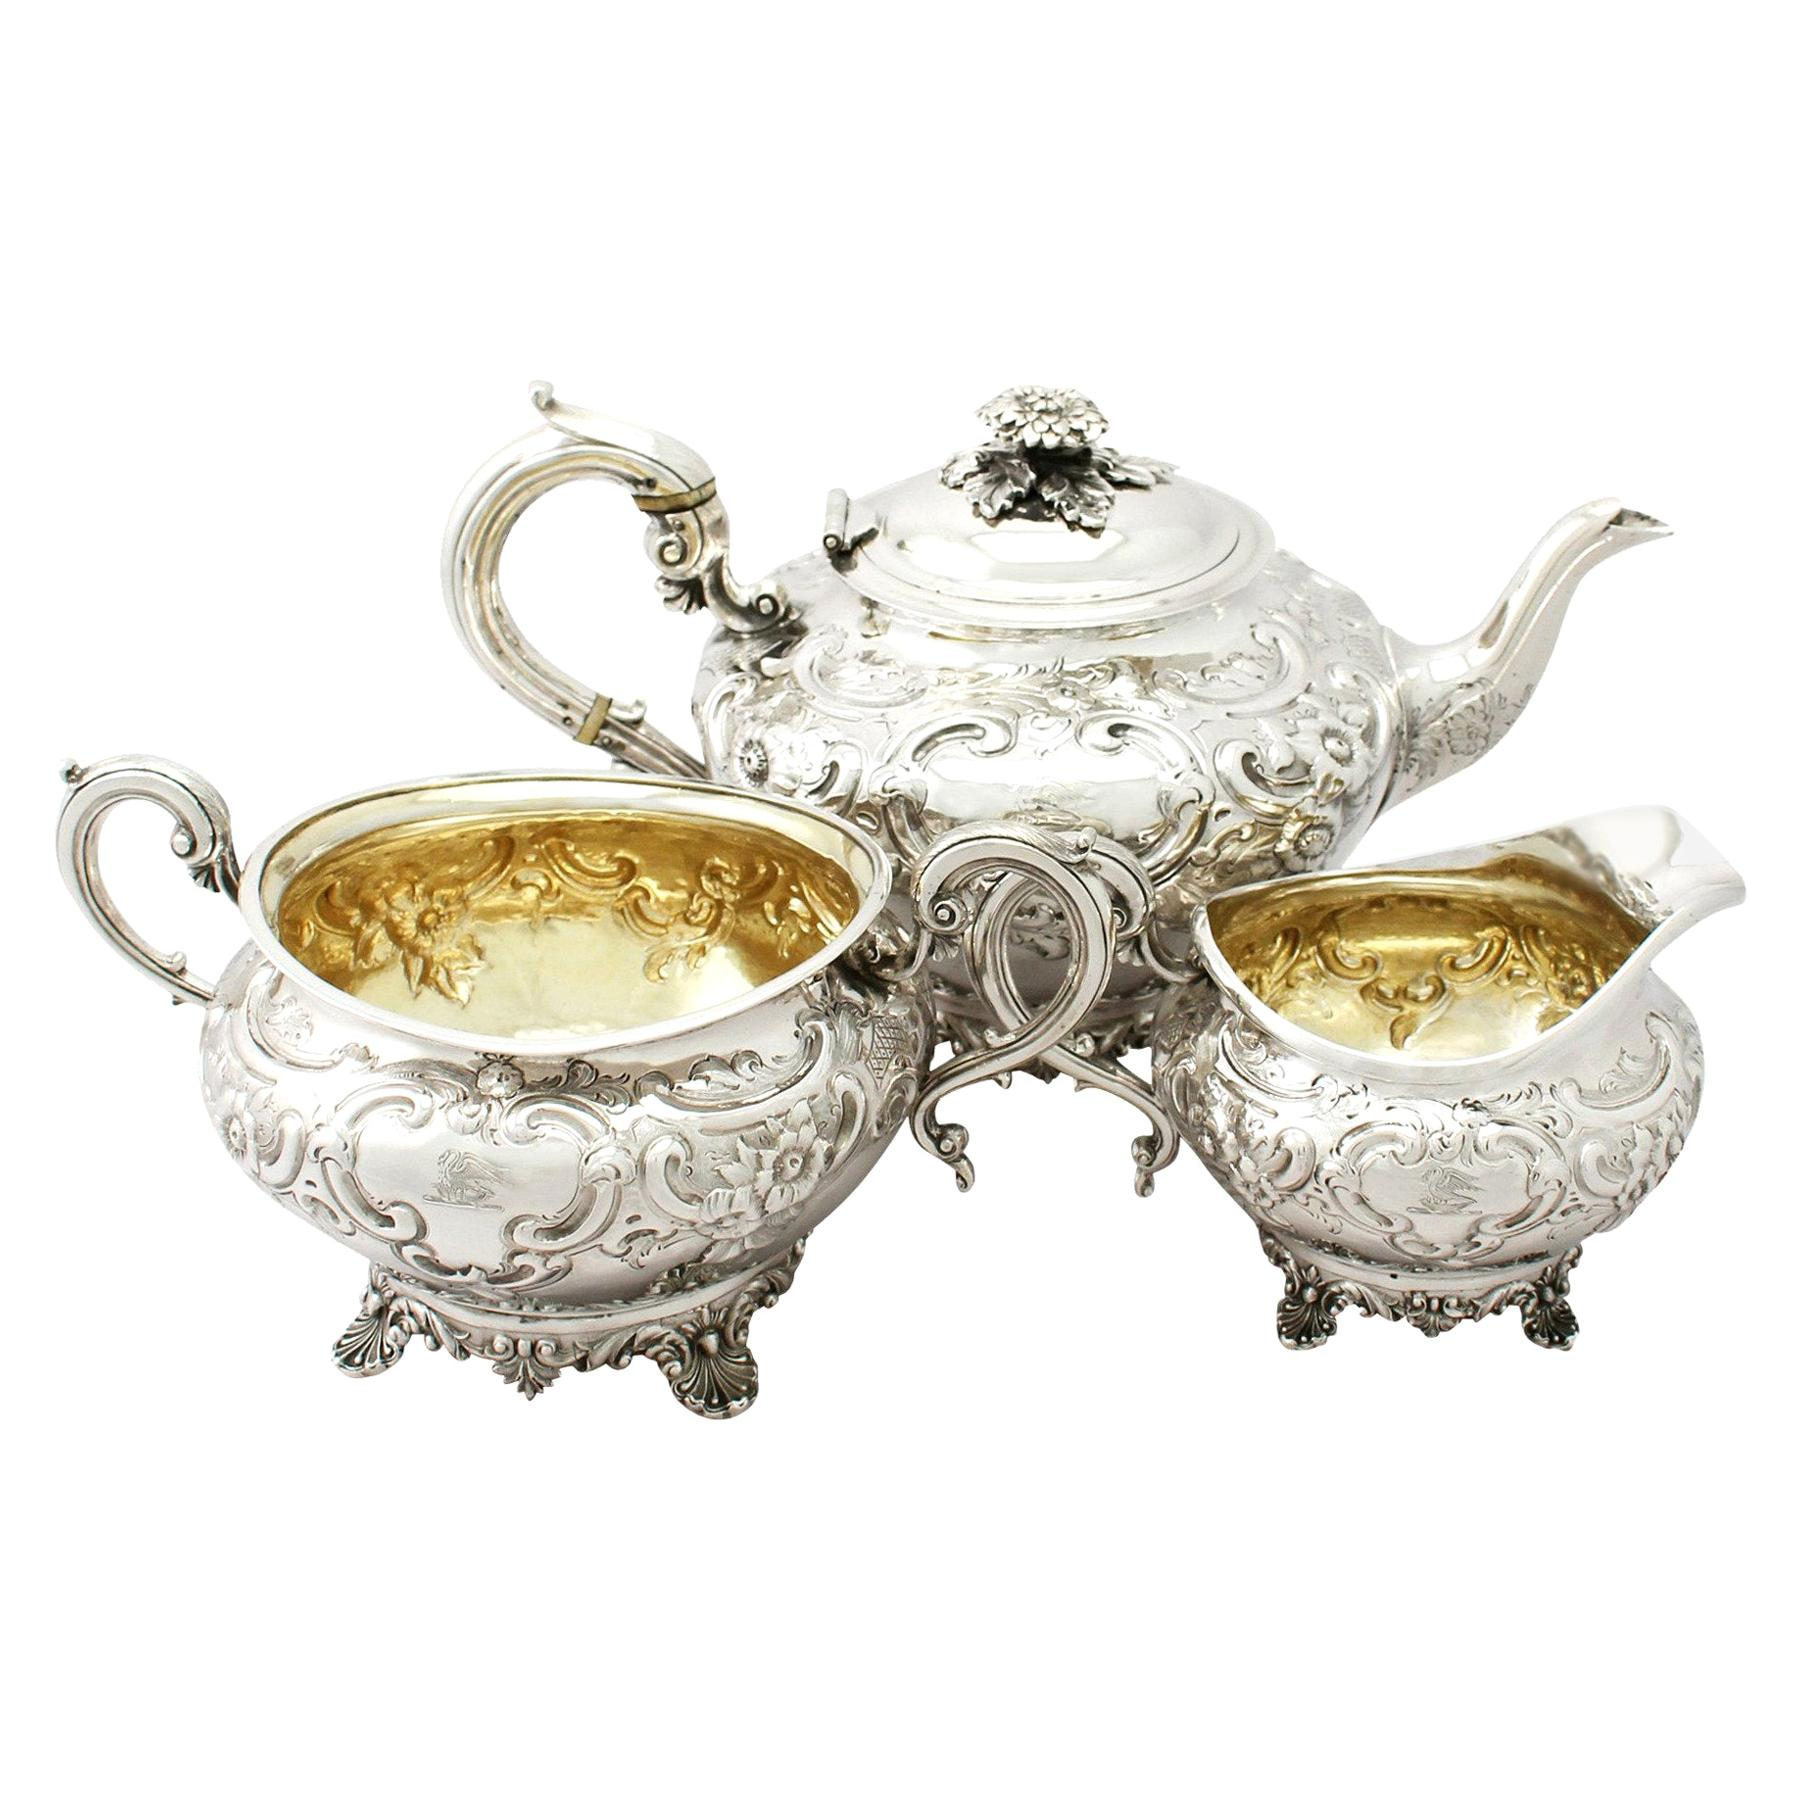 Antique George III Sterling Silver Three-Piece Tea Service